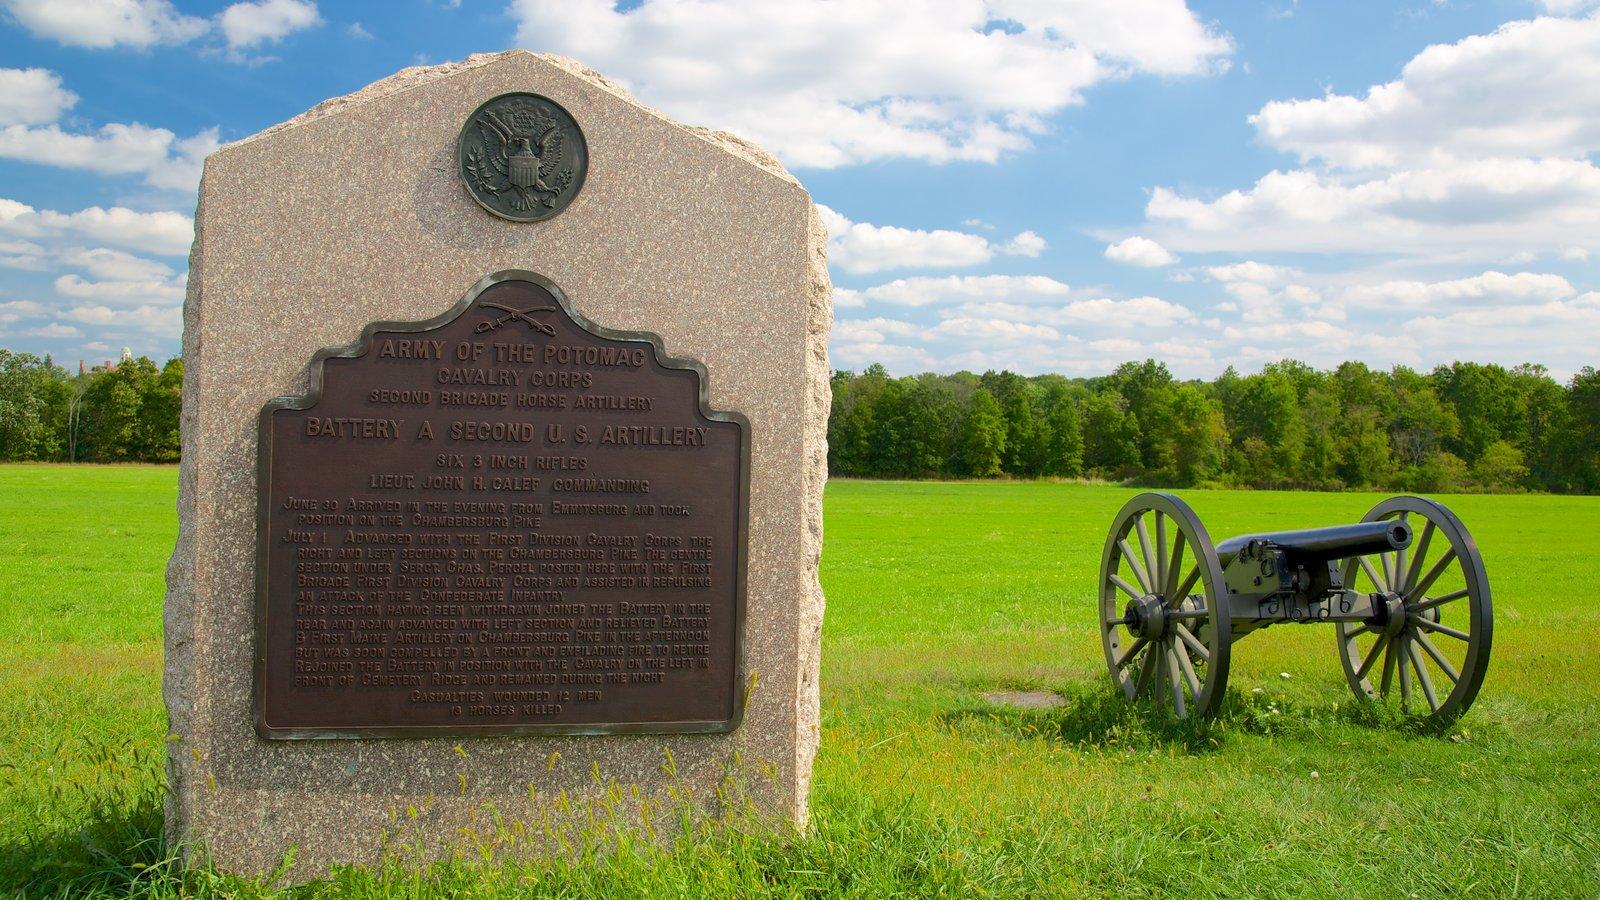 Gettysburg National Military Park mostrando um jardim